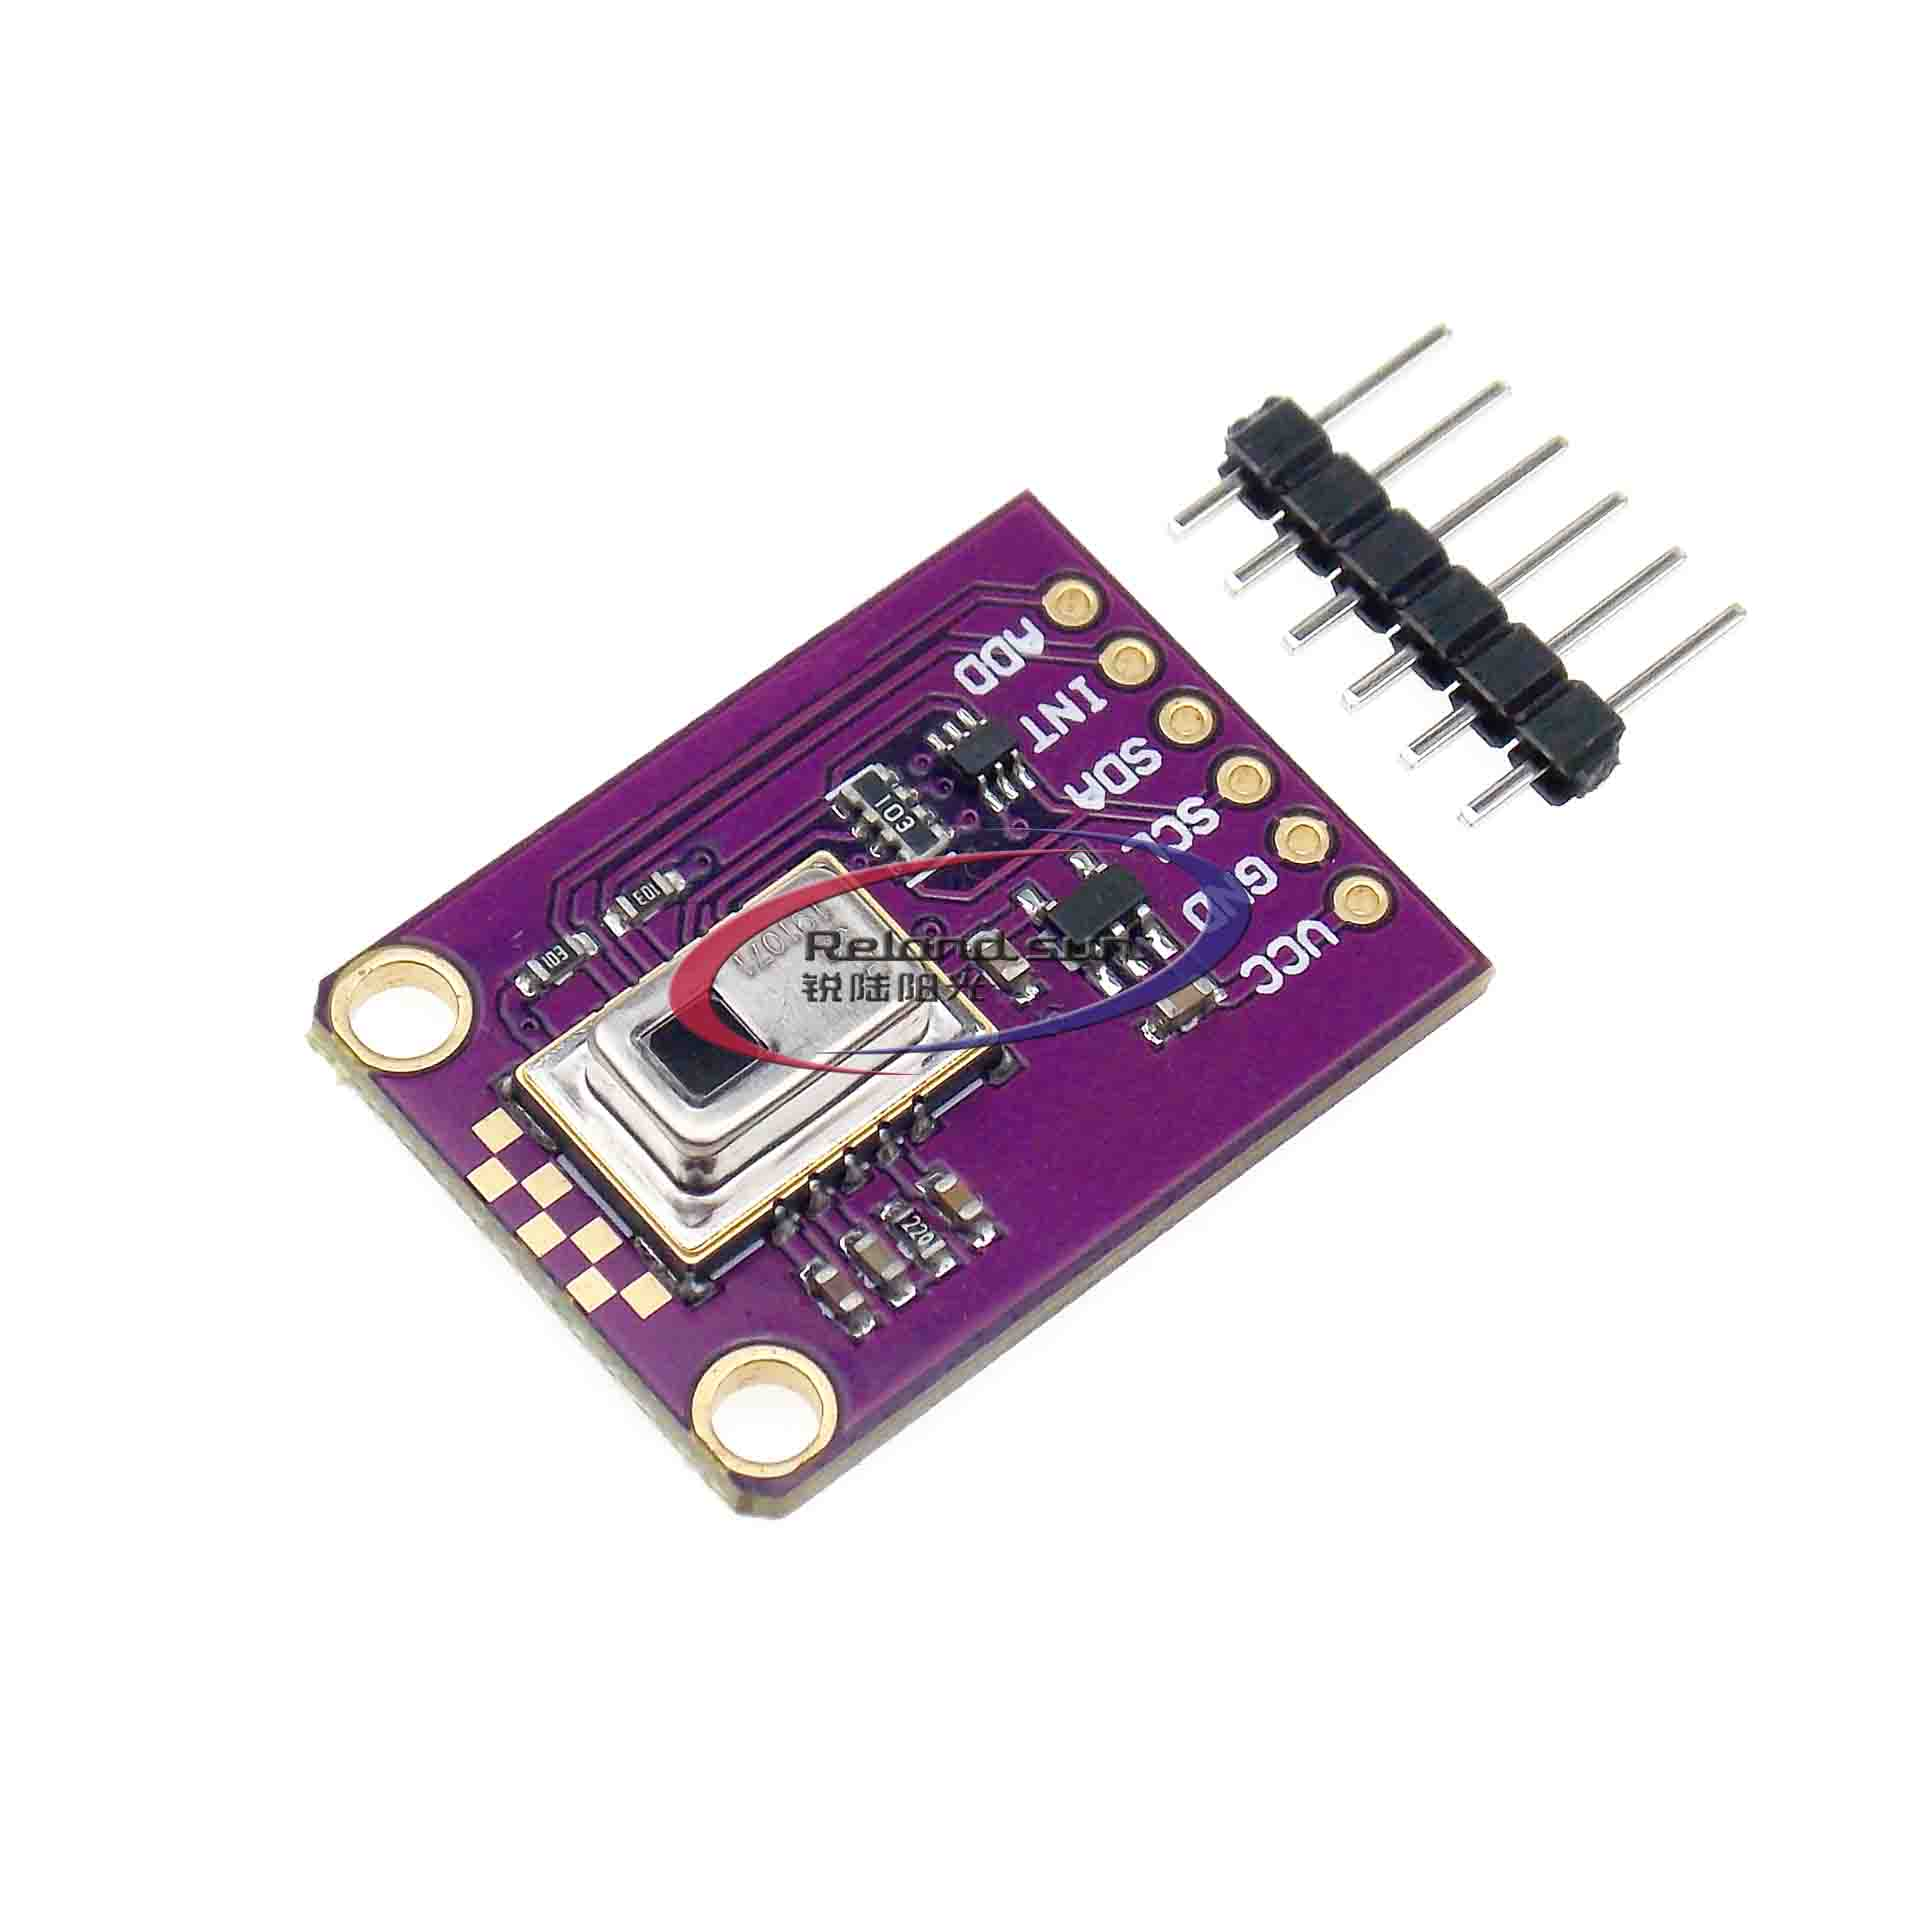 MCU-833 AMG8833 8x8 cámara térmica infrarrojo IR Array Sensor de imagen térmica